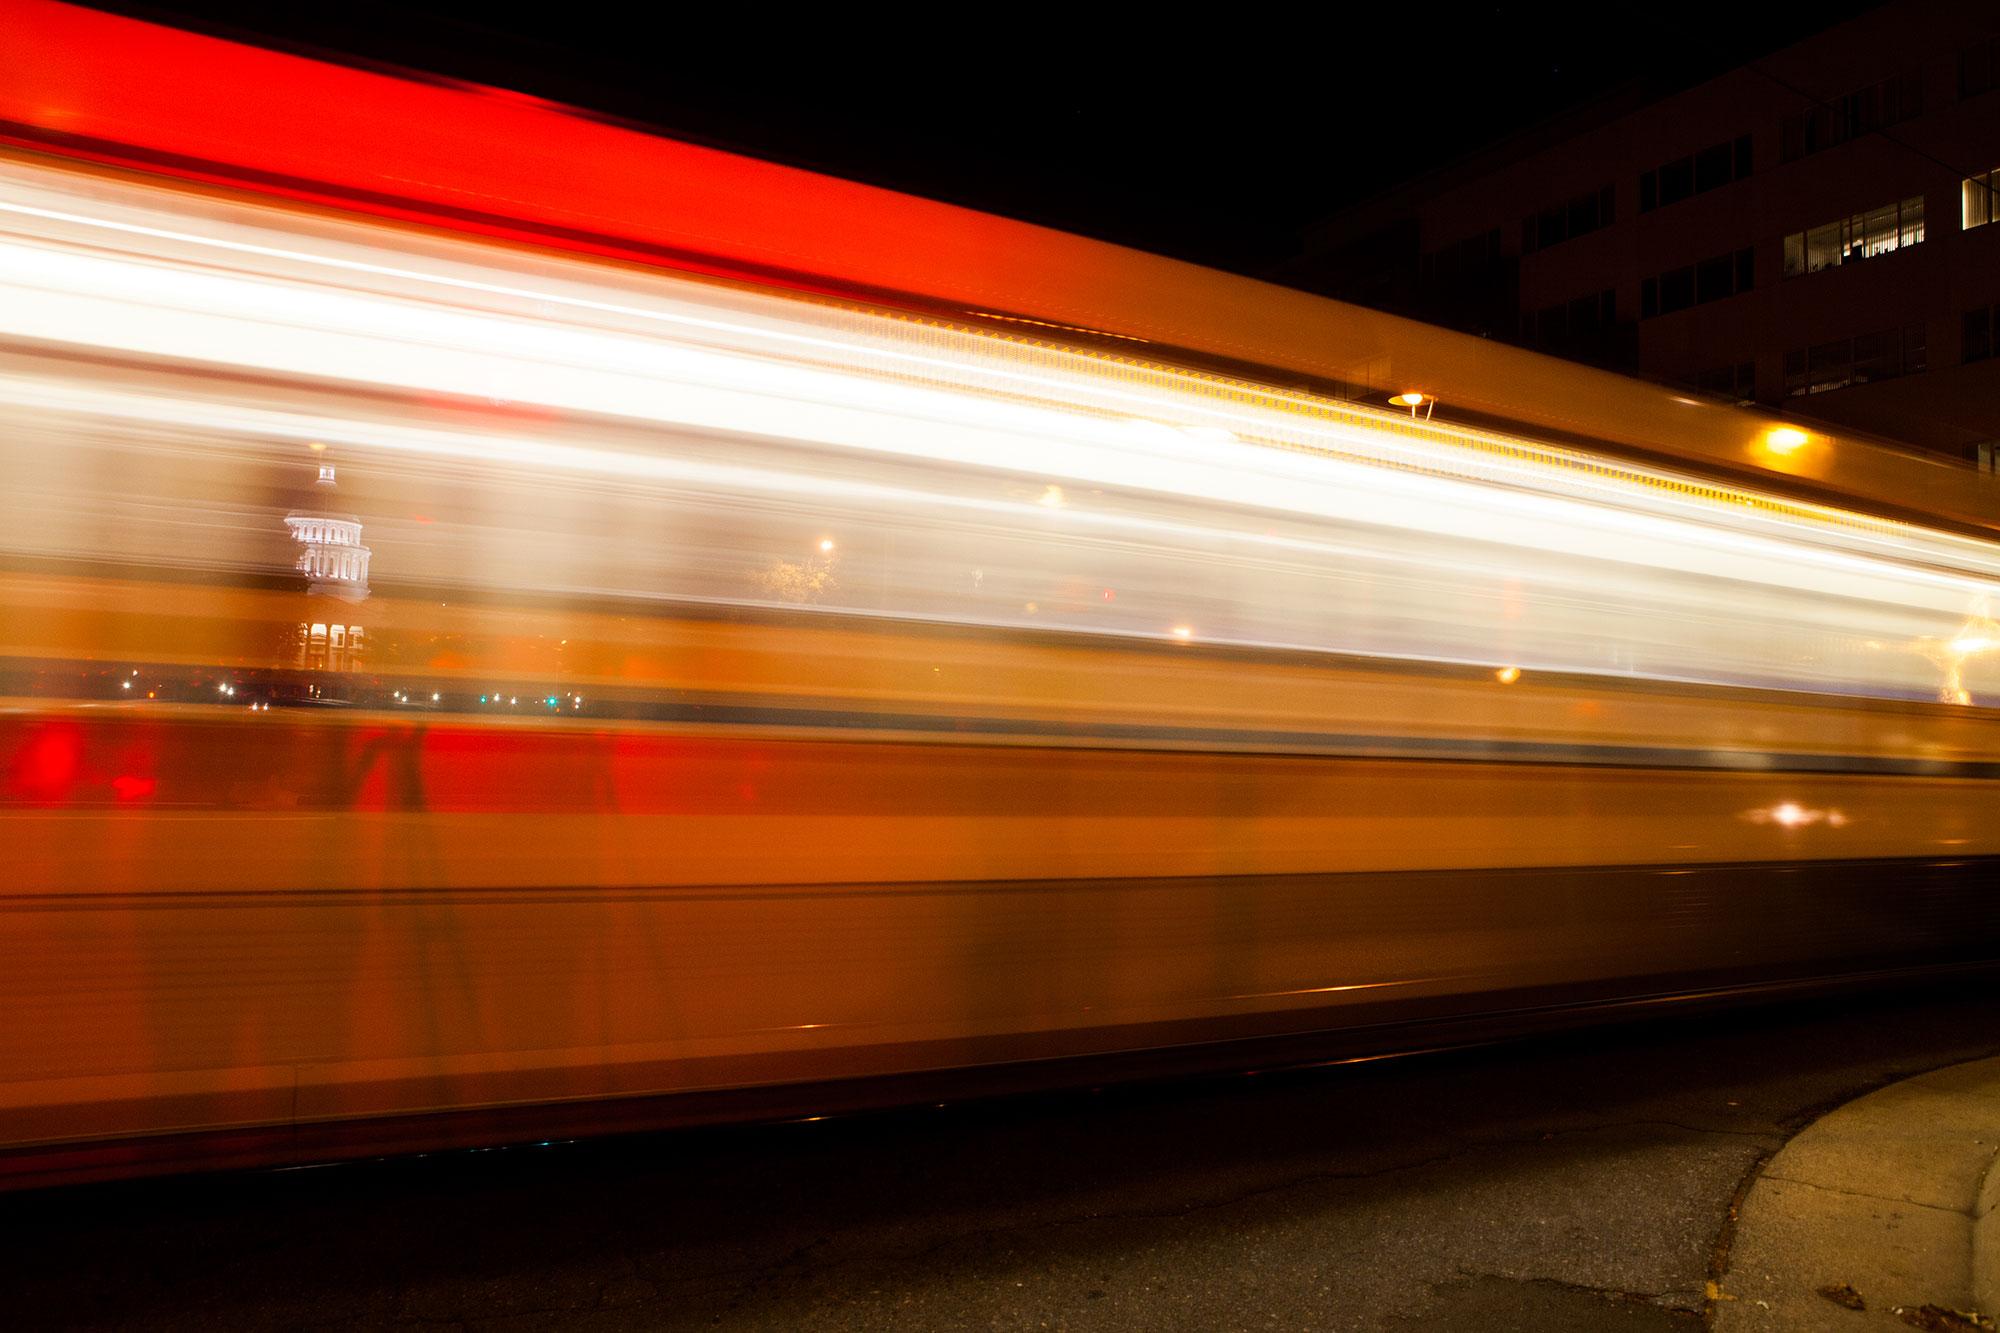 miriello-grafico-MTS-San-Diego-Transportation-bus-trolley-rapid-branding-agency-22.jpg